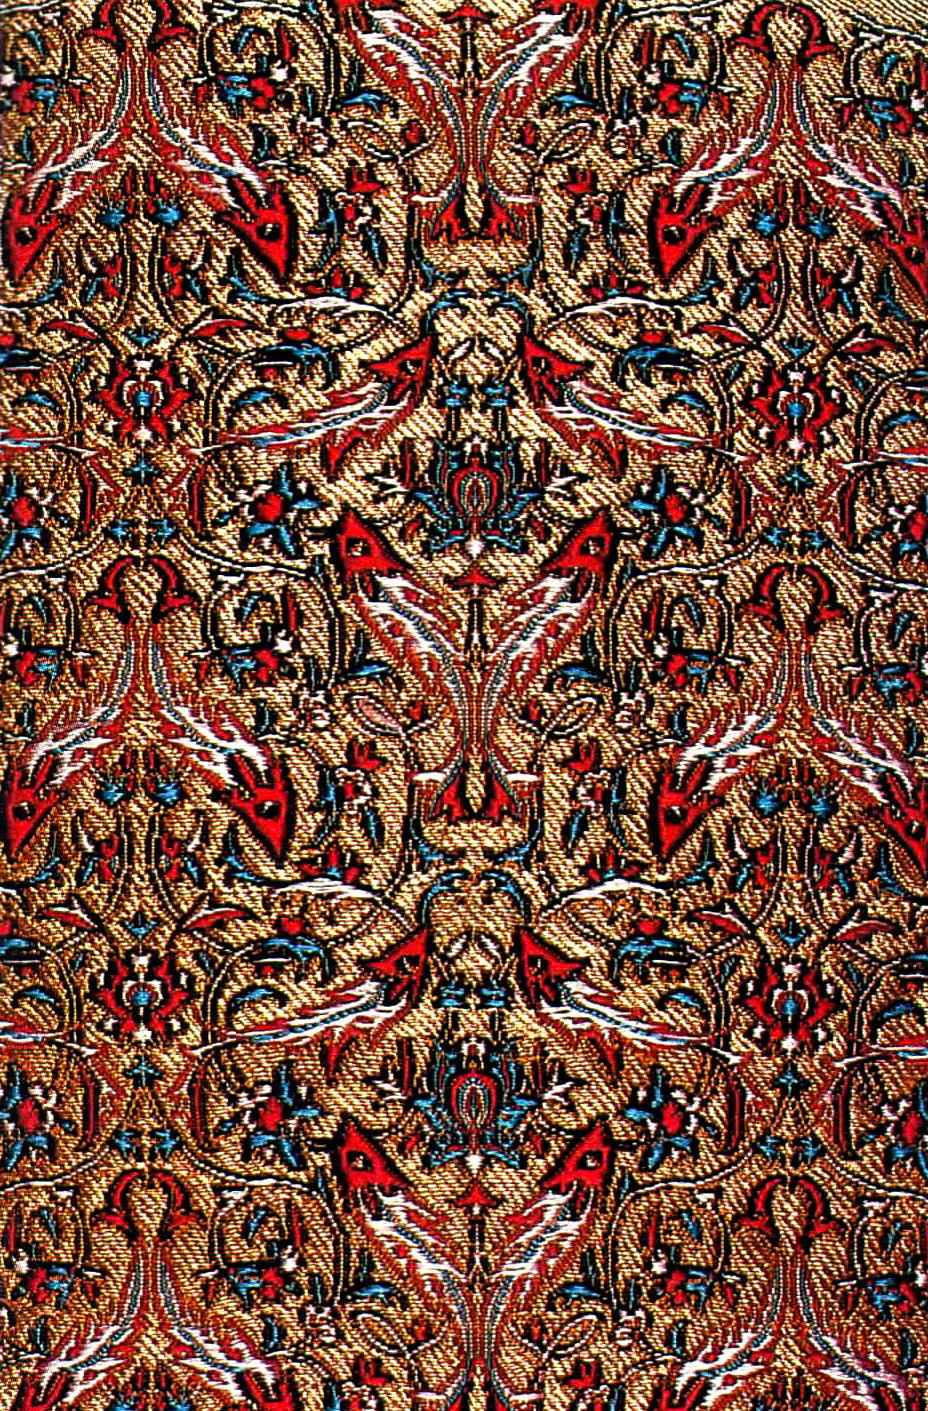 rugs 101 defining oriental rug designs ahdootcityrugs. Black Bedroom Furniture Sets. Home Design Ideas